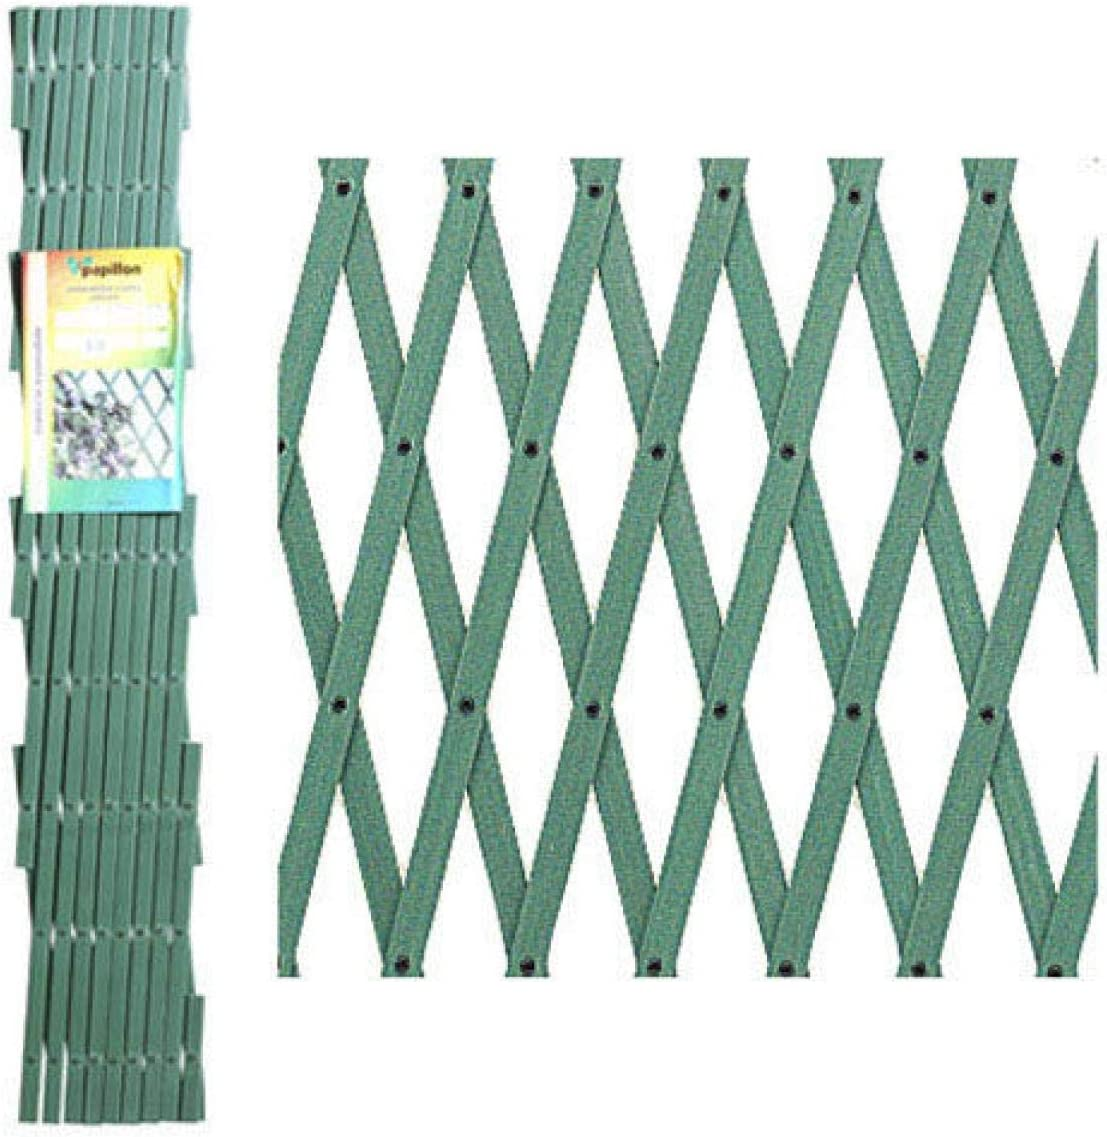 Papillon 8091545 Celosia PVC Verde Extensible 3x1 Metros, 3x1m ...